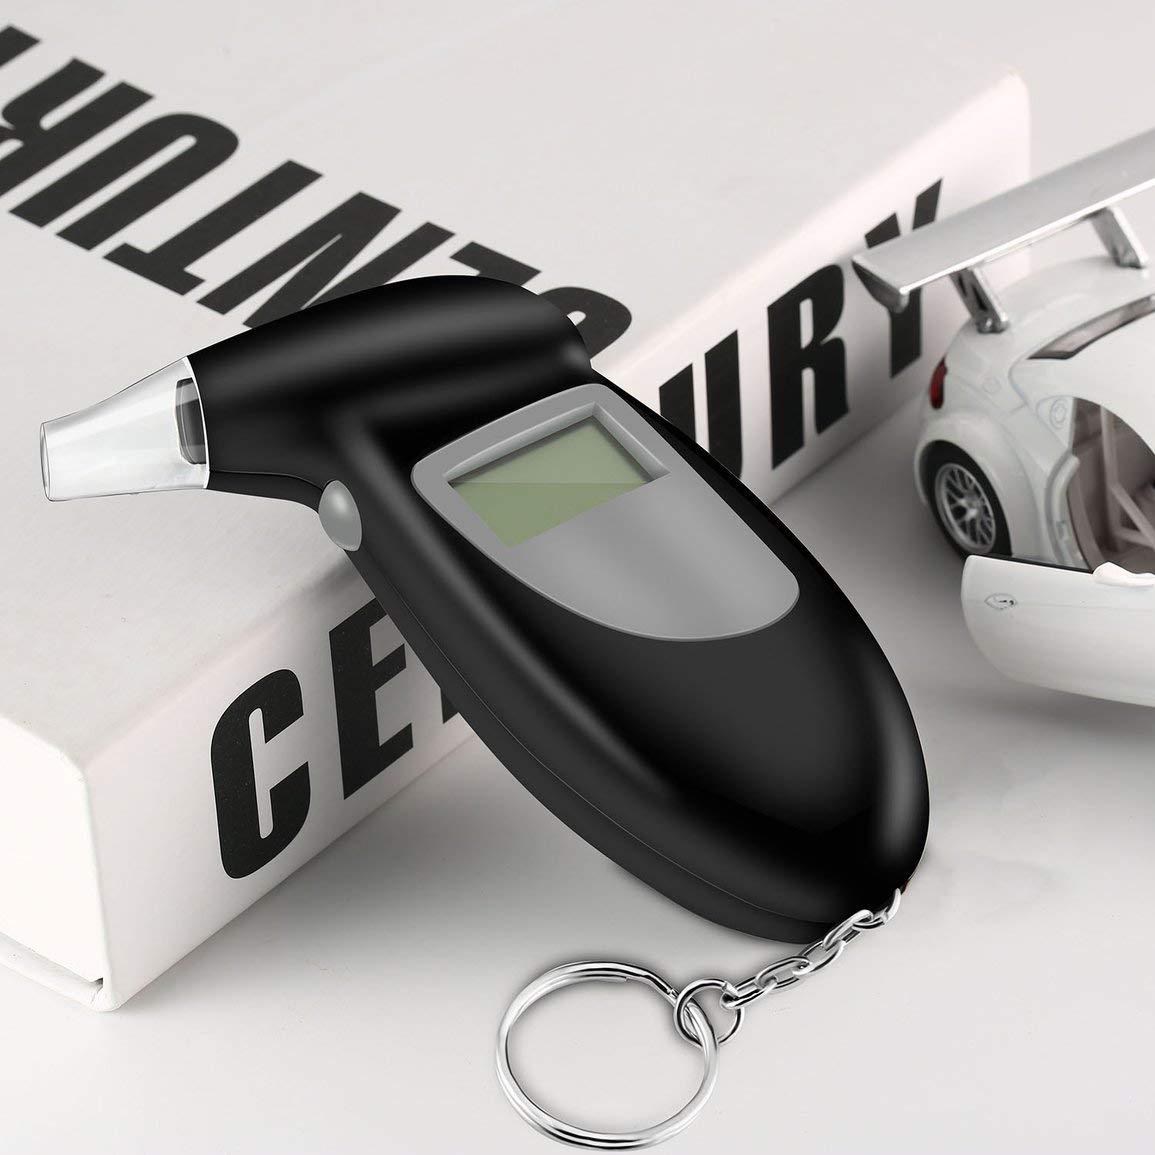 Garciadia Digital Alkohol Tester Alkoholtester Analyzer Detector Test Keychain Alkoholtester Alkoholtester Ger/ät LCD-Display Farbe: Schwarz /& Grau